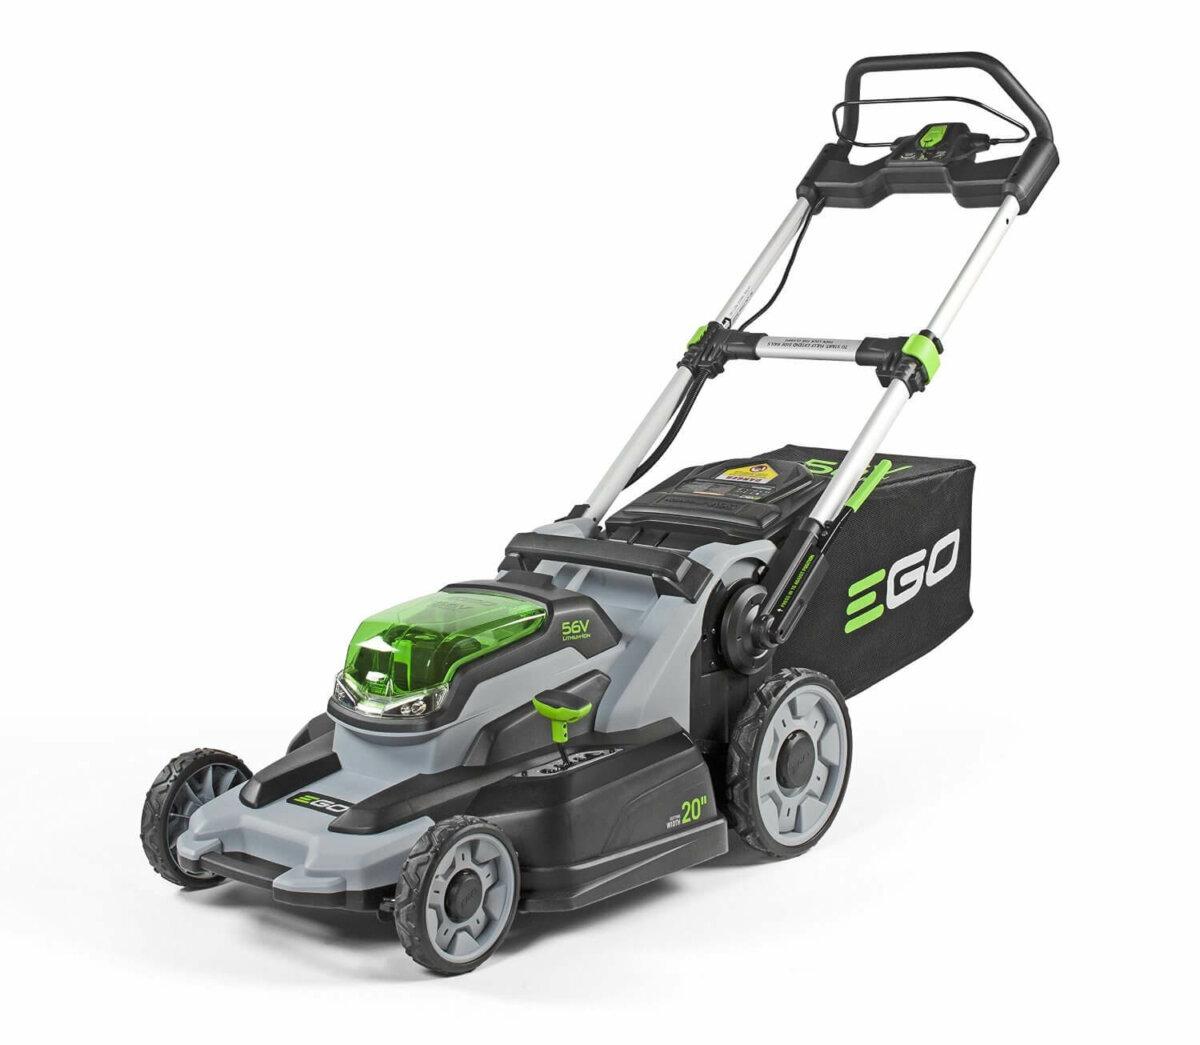 ego-20-inch-cordless-mower